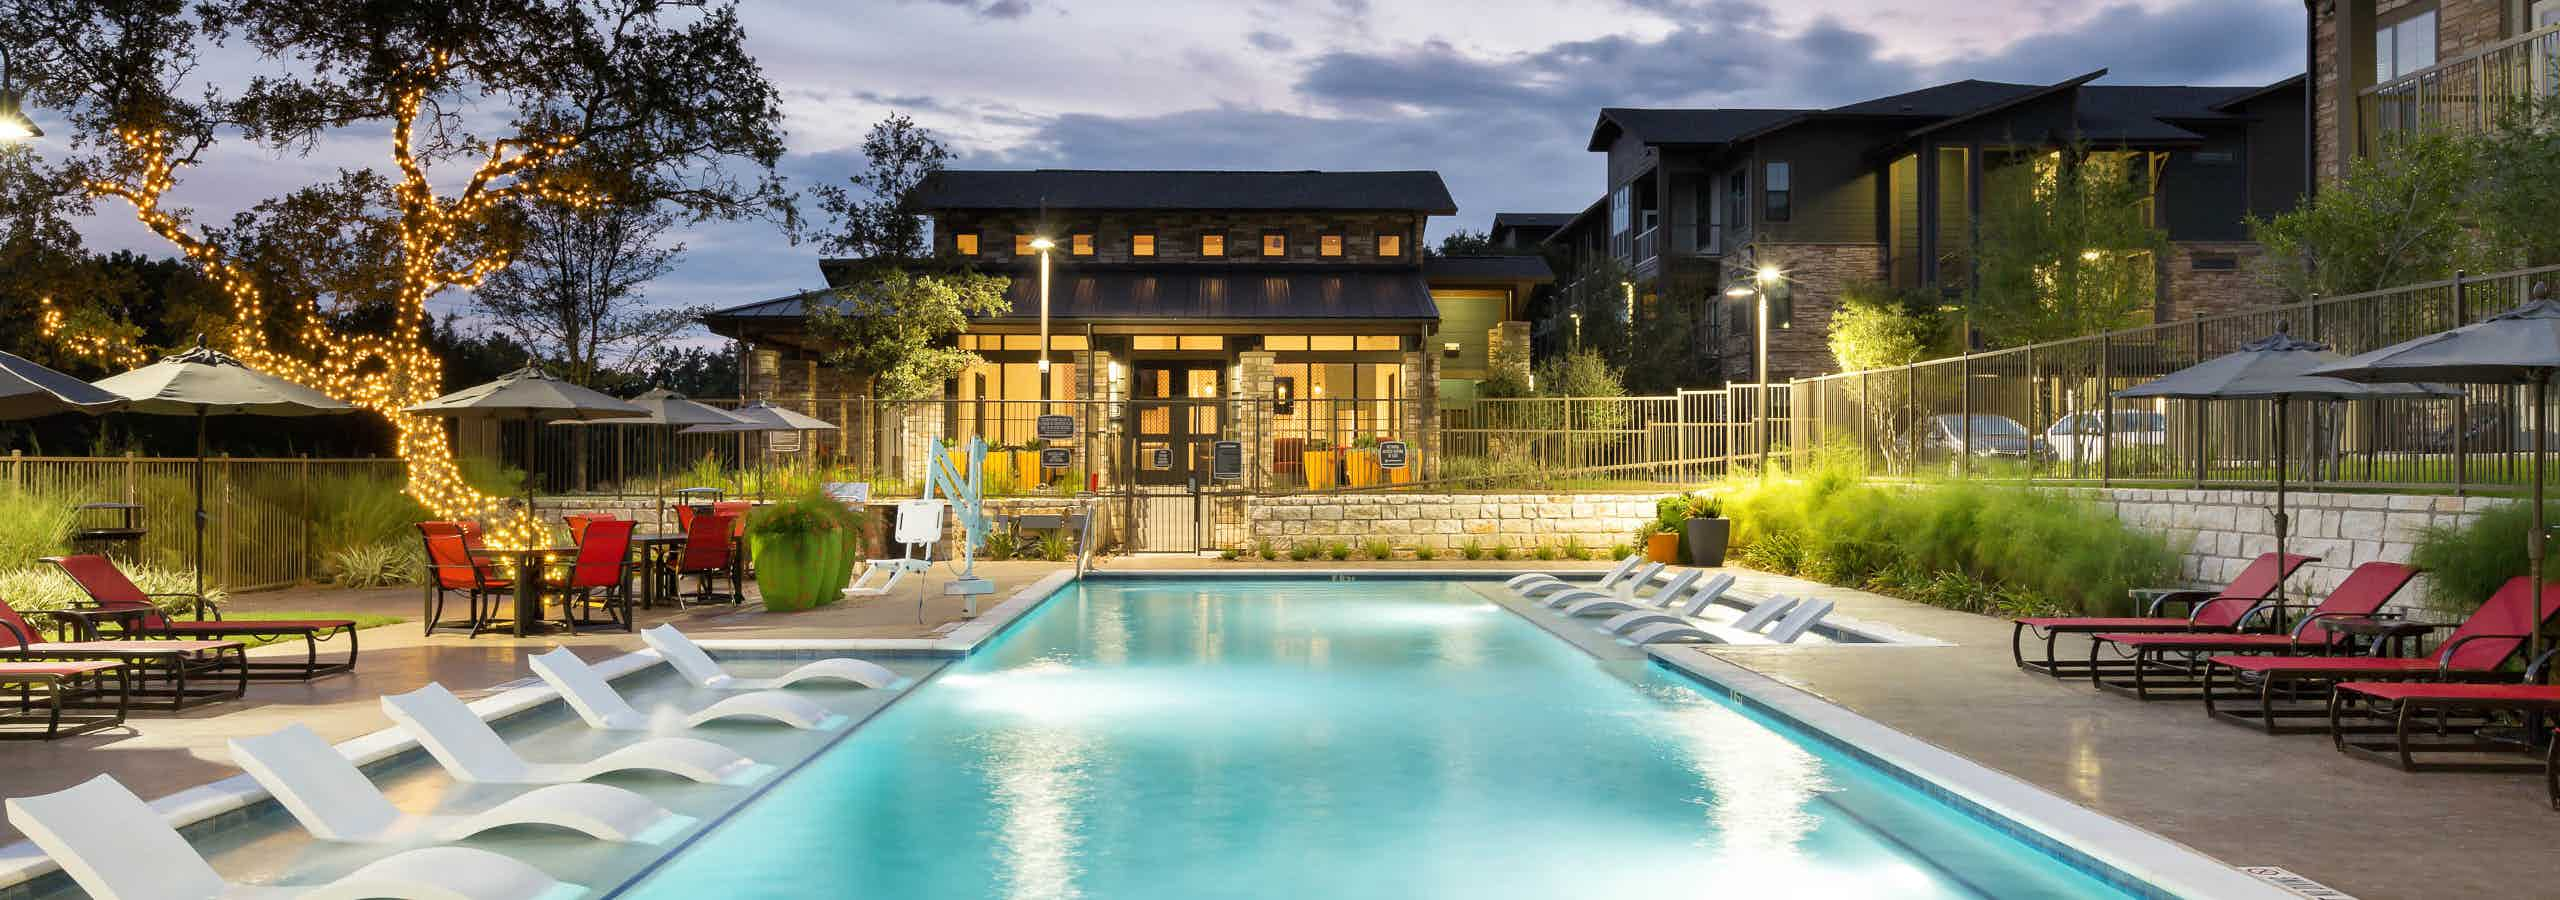 property header